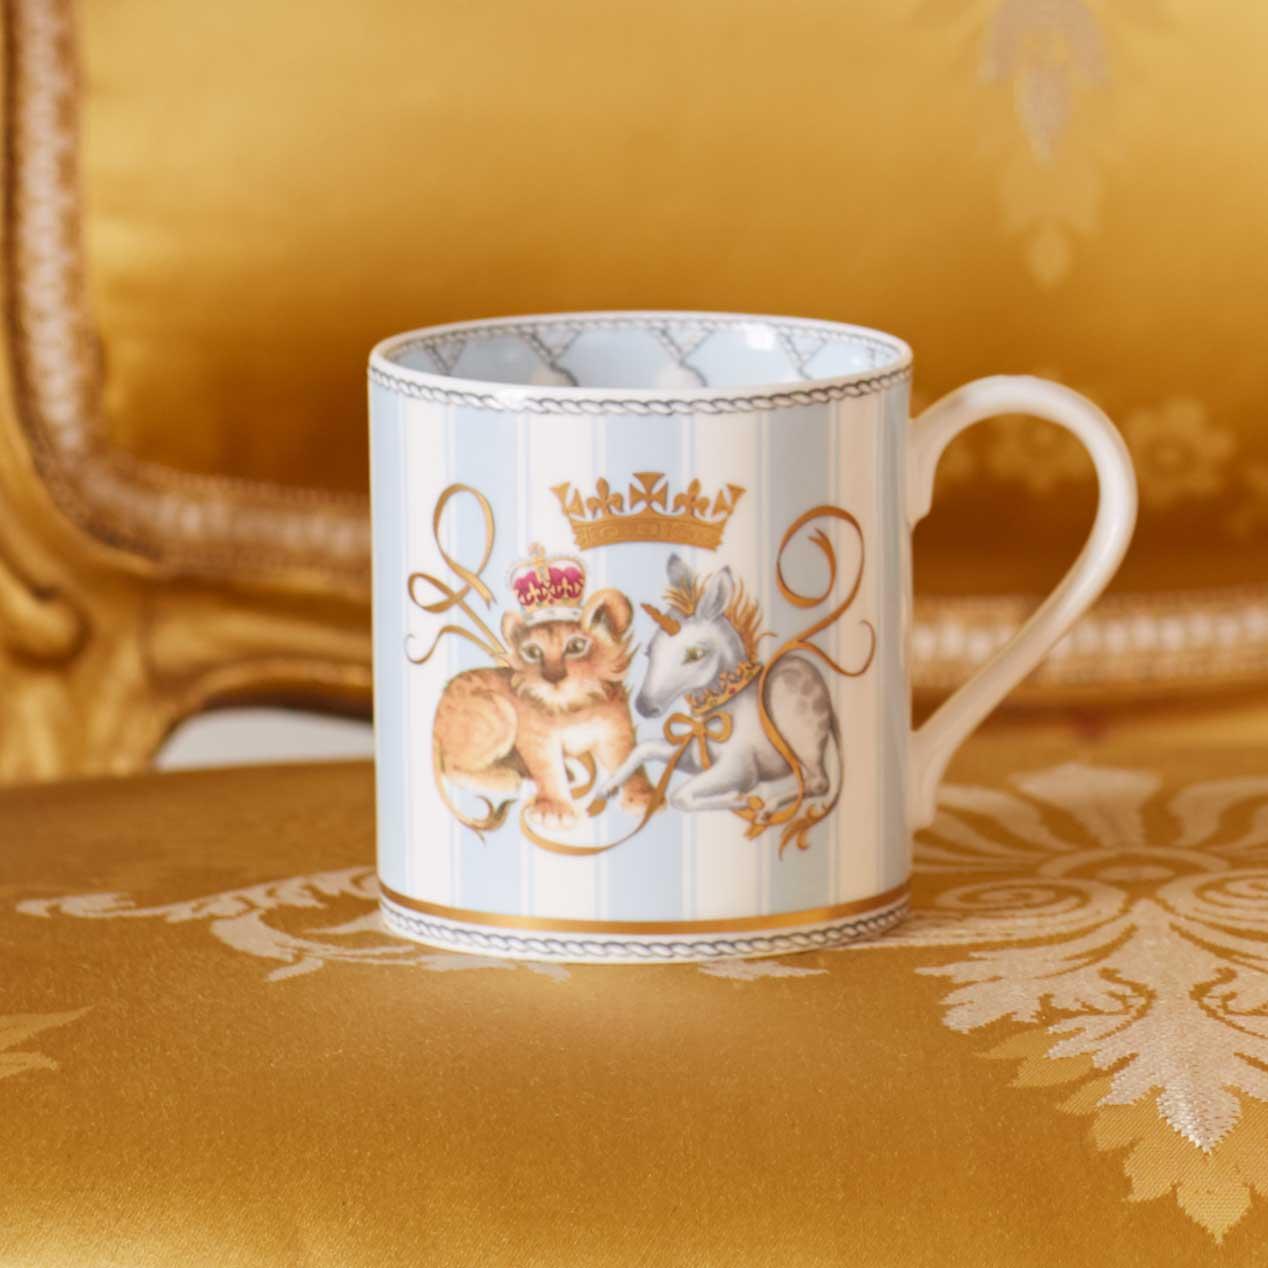 Souvenir Teapot Mug Baby Born Official Commemorative Range Buy Royal Baby Commemorative Mug From The Buckingham Palace Online Shop